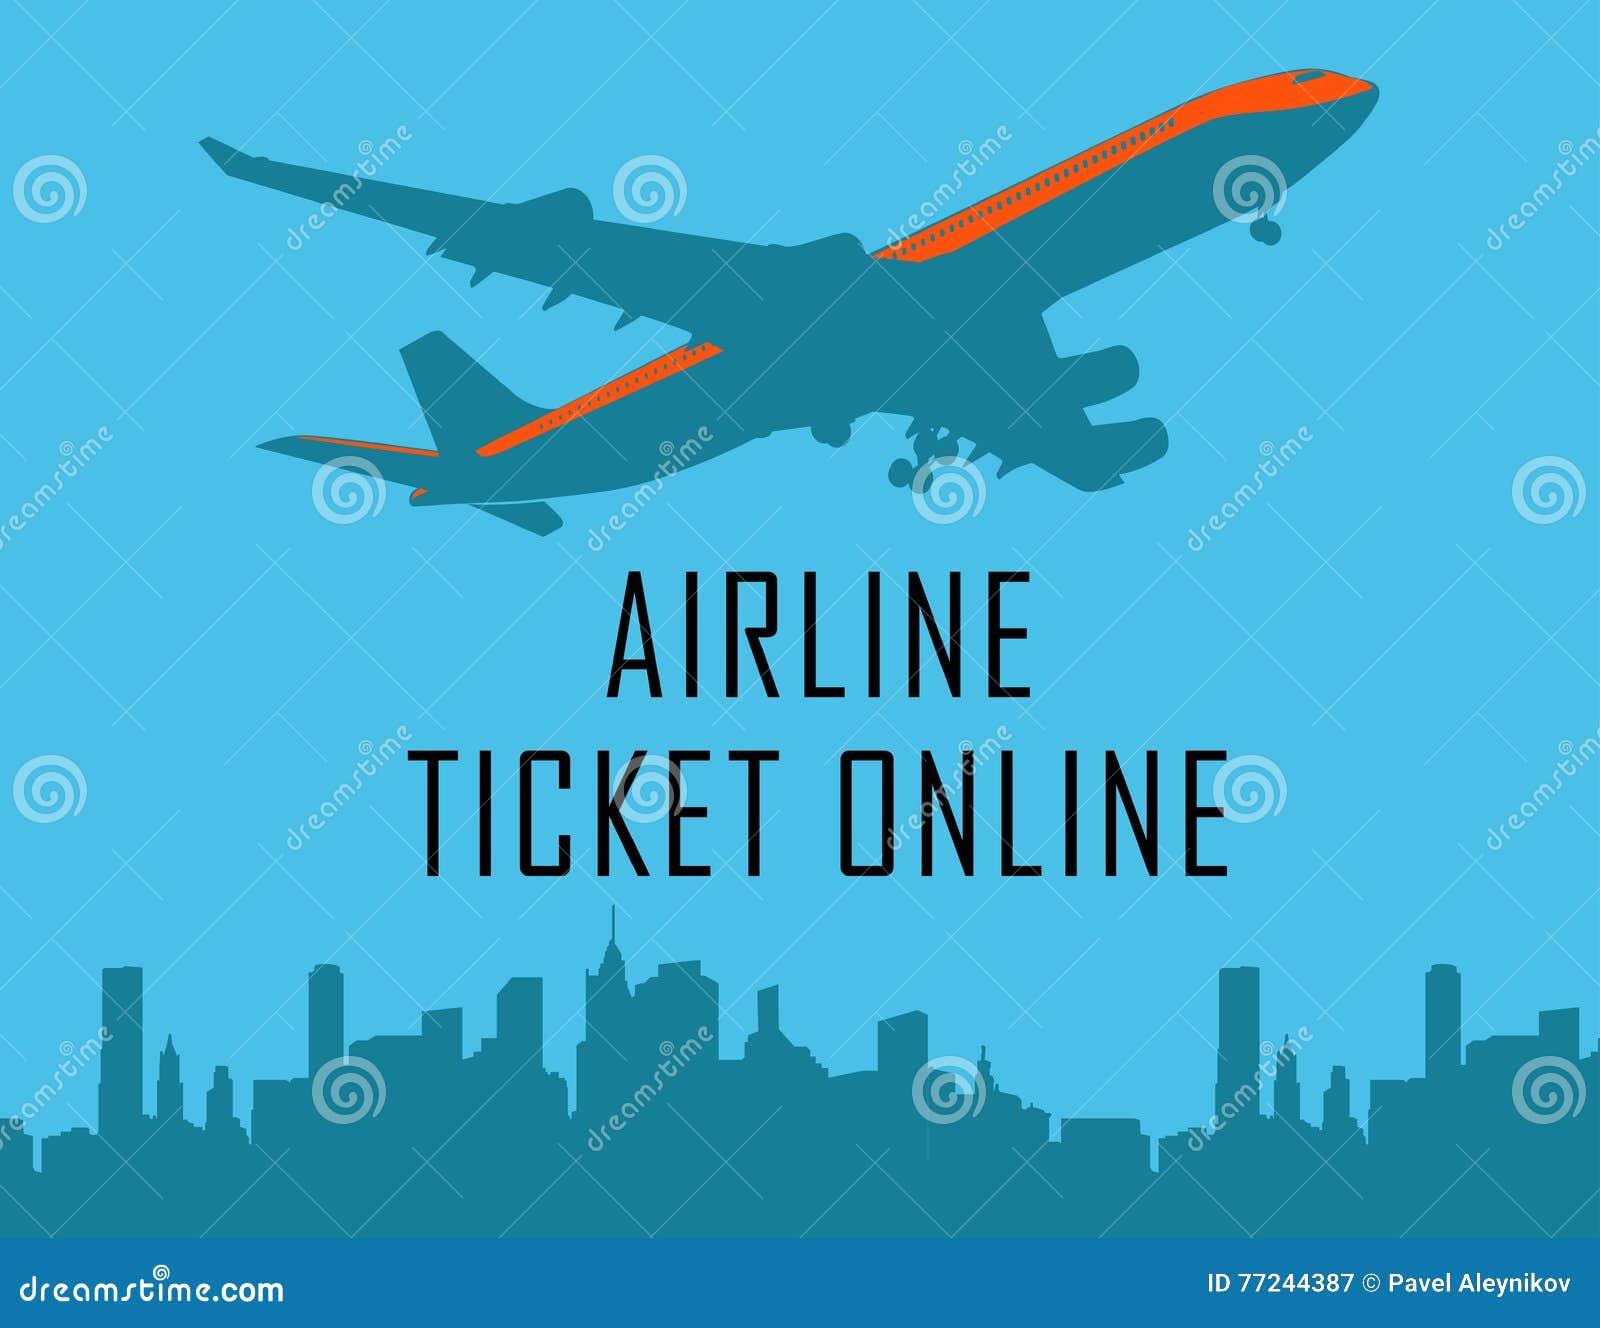 Vector Design Template With Plane, Online Design Eliments